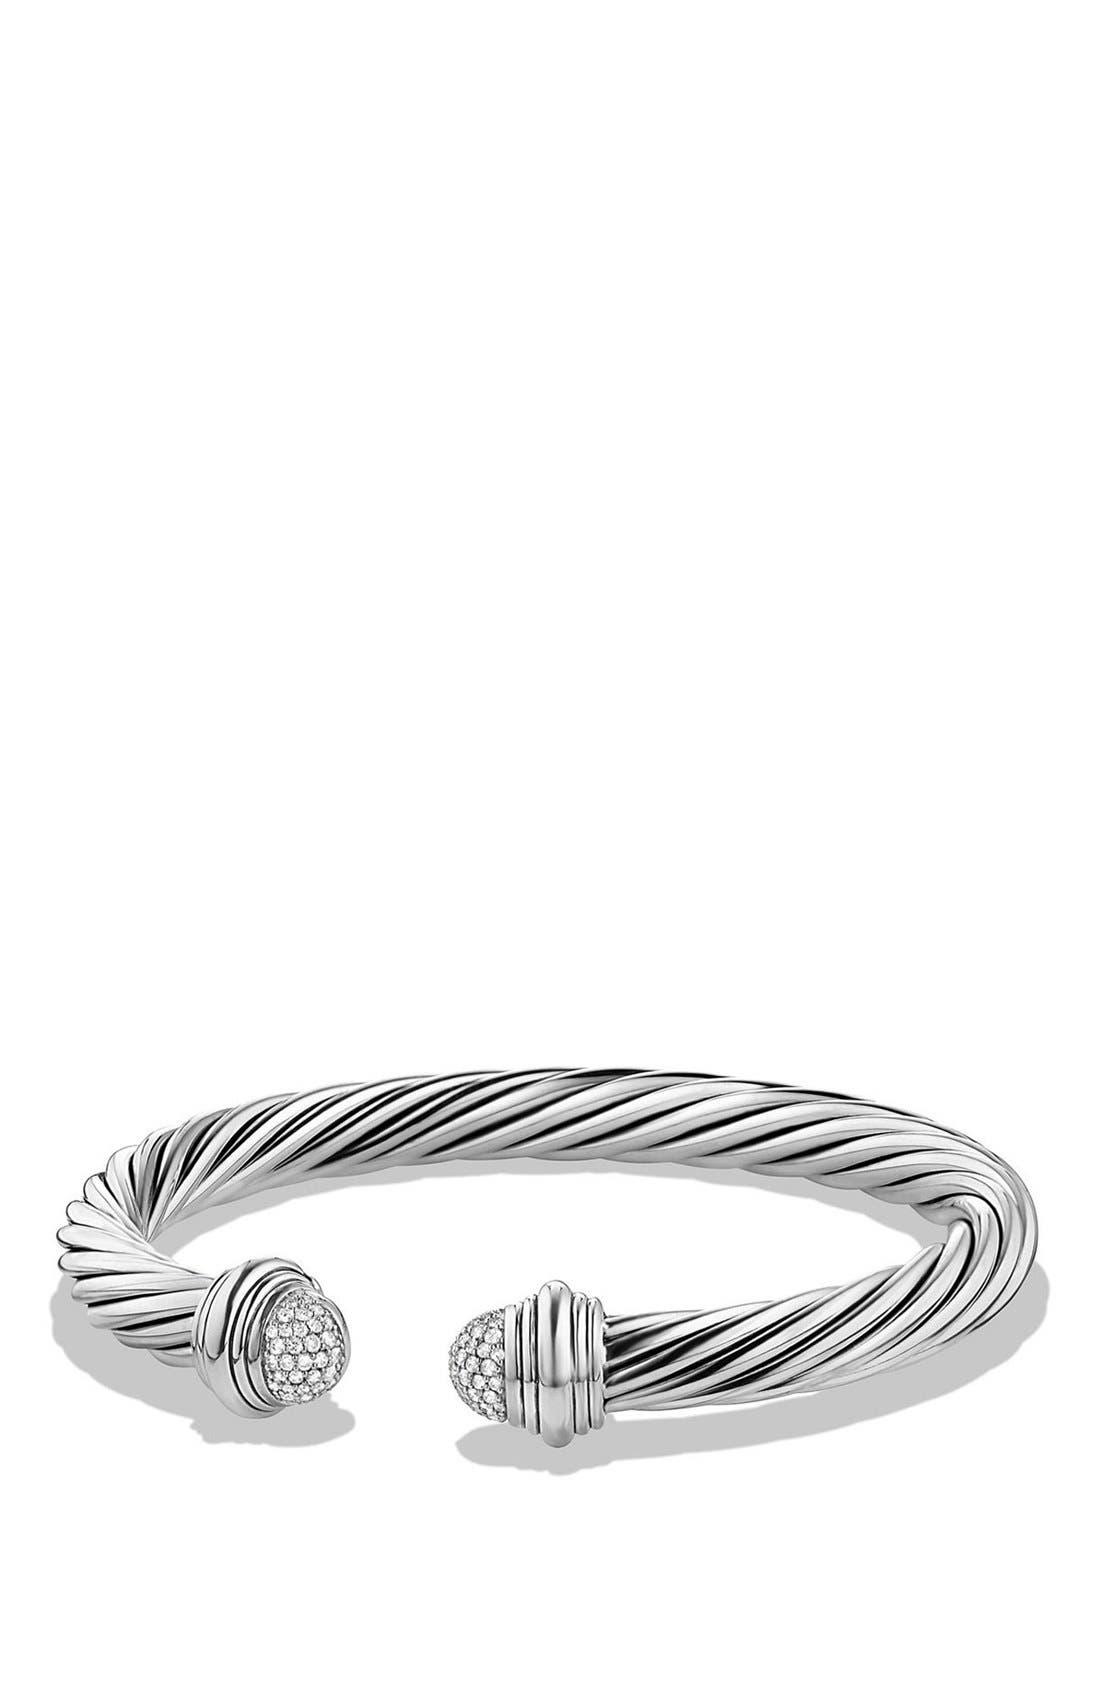 Cable Classics Bracelet with Black Diamonds, 7mm,                             Main thumbnail 1, color,                             SILVER